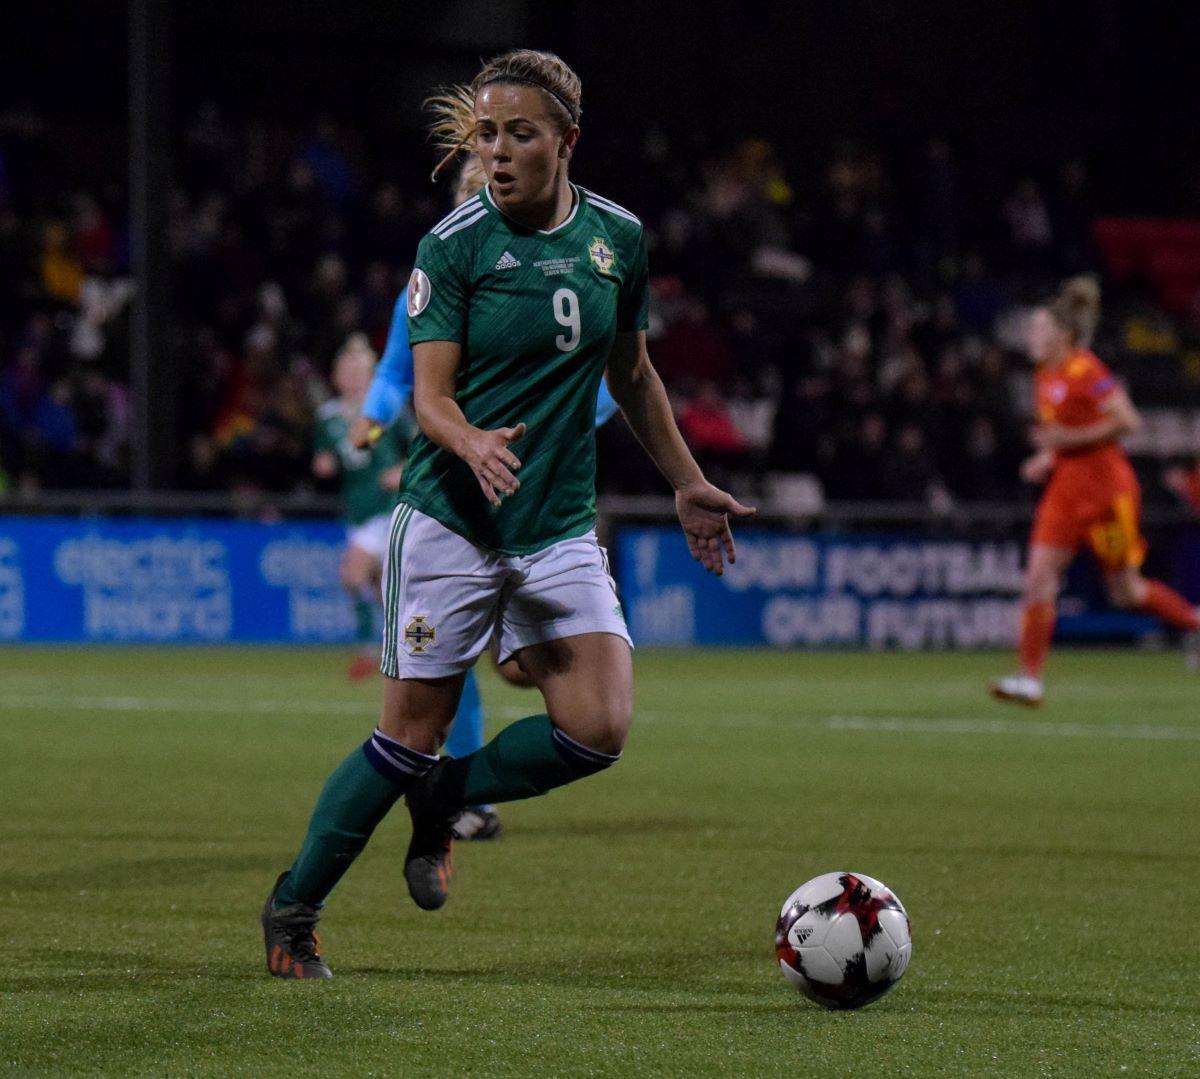 Northern Ireland's Simone Magil